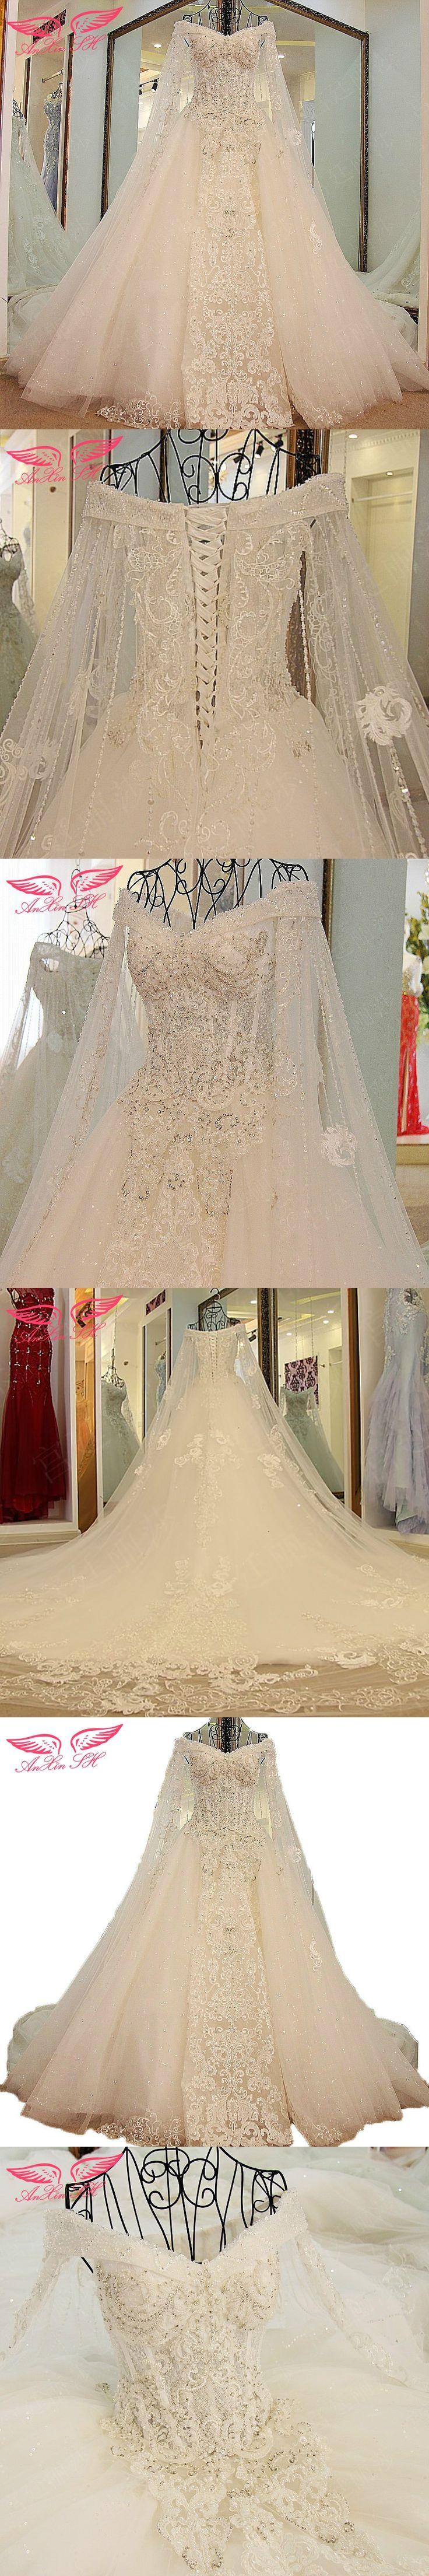 AnXin SH Korean bride white lace wedding dress lace flowers Bride lace trailing wedding dress xj45880